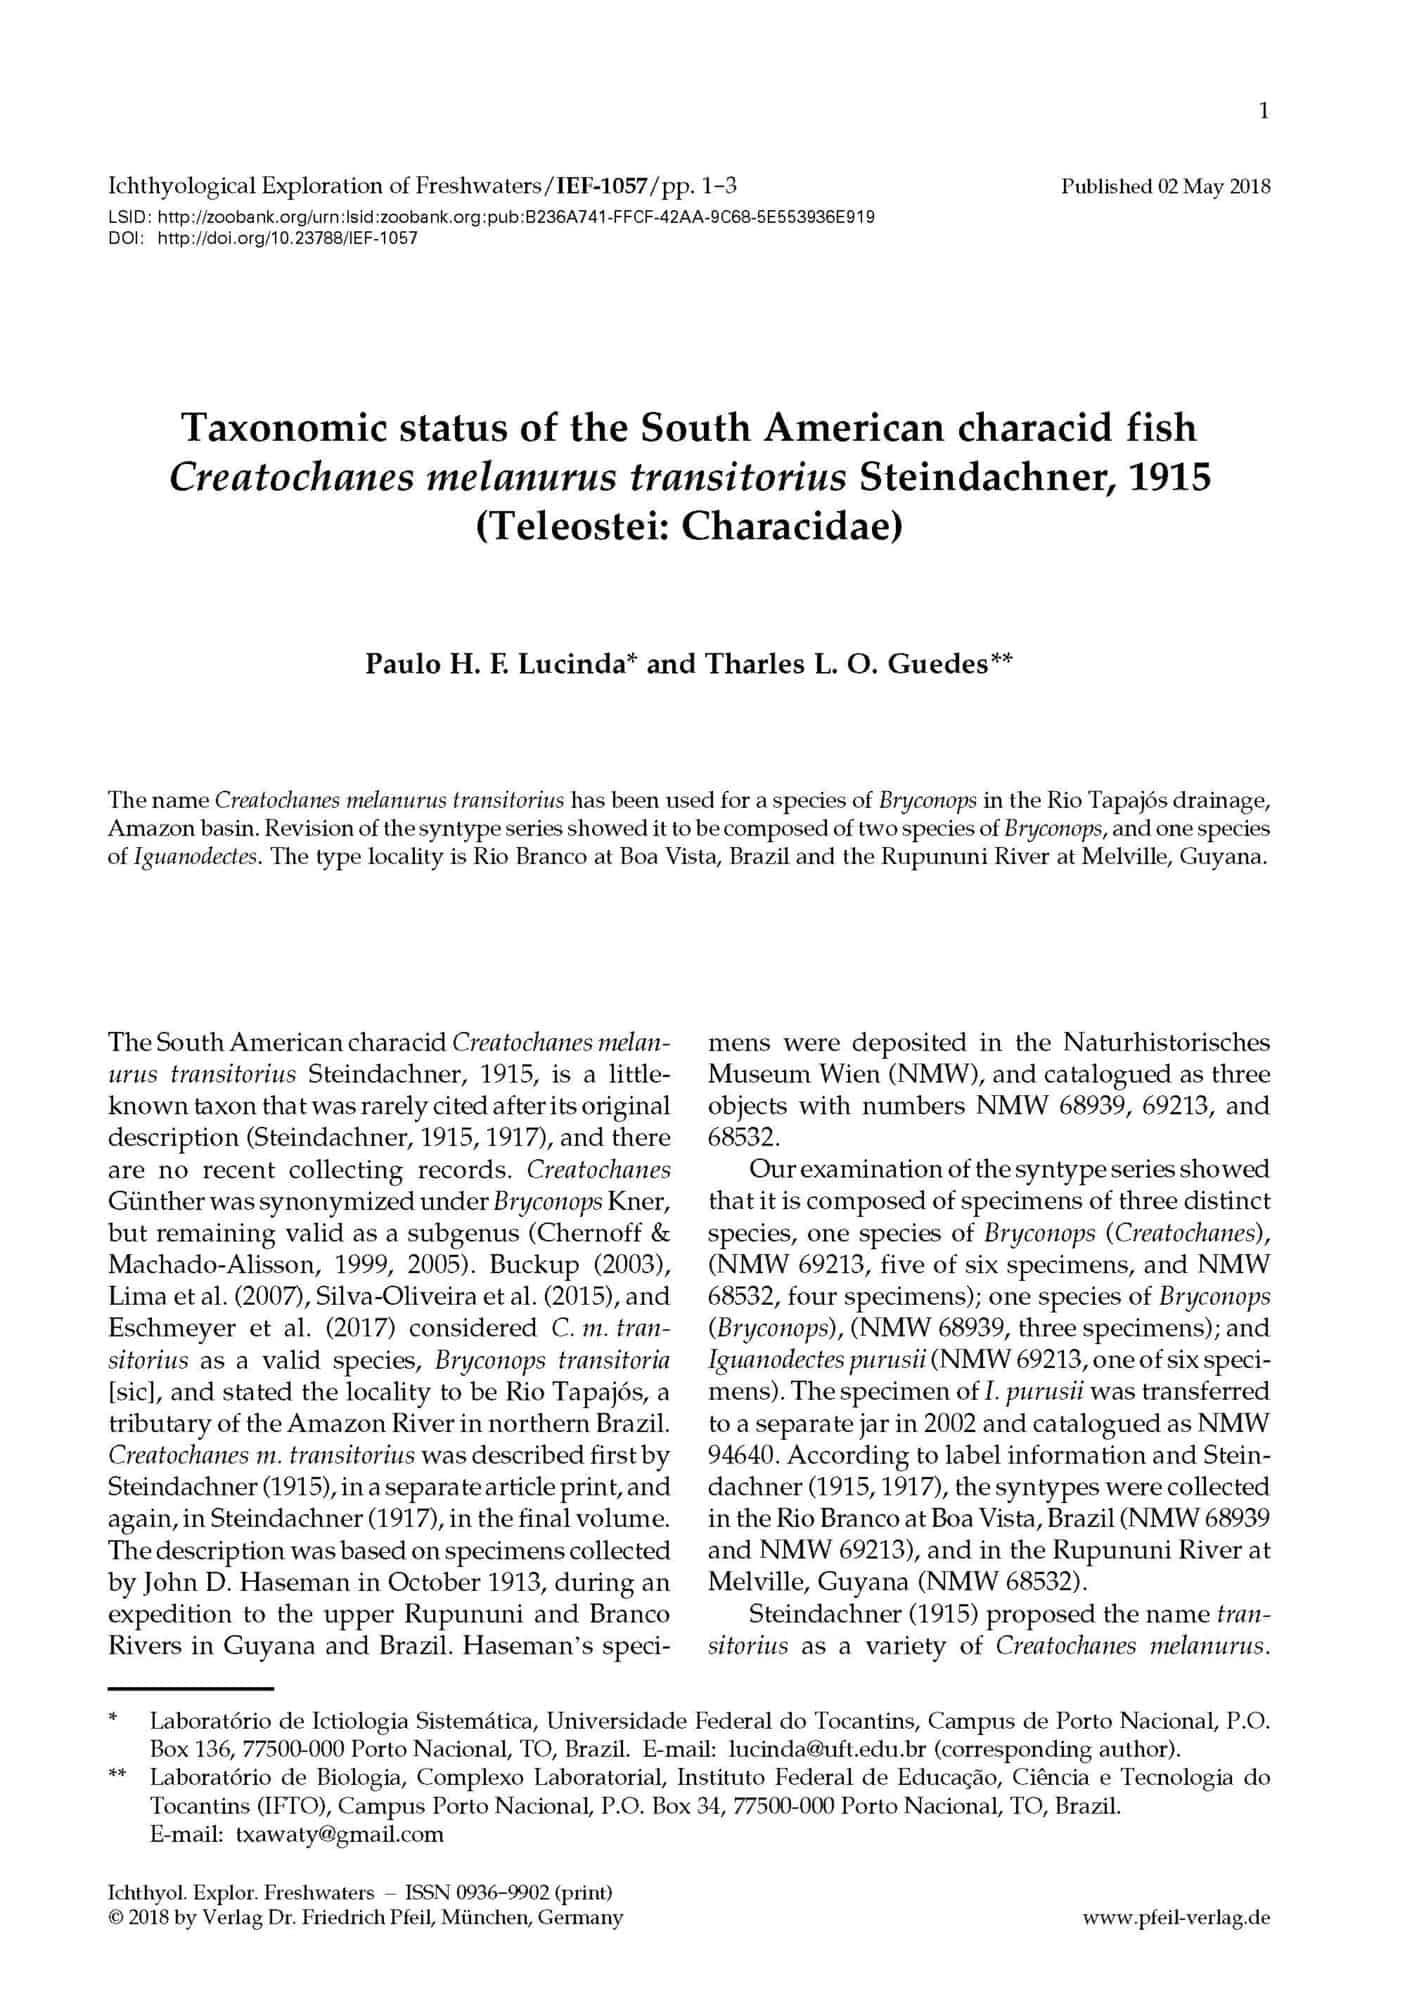 Taxonomic status of the South American characid fish Creatochanes melanurus transitorius Steindachner, 1915 (Teleostei: Characidae)